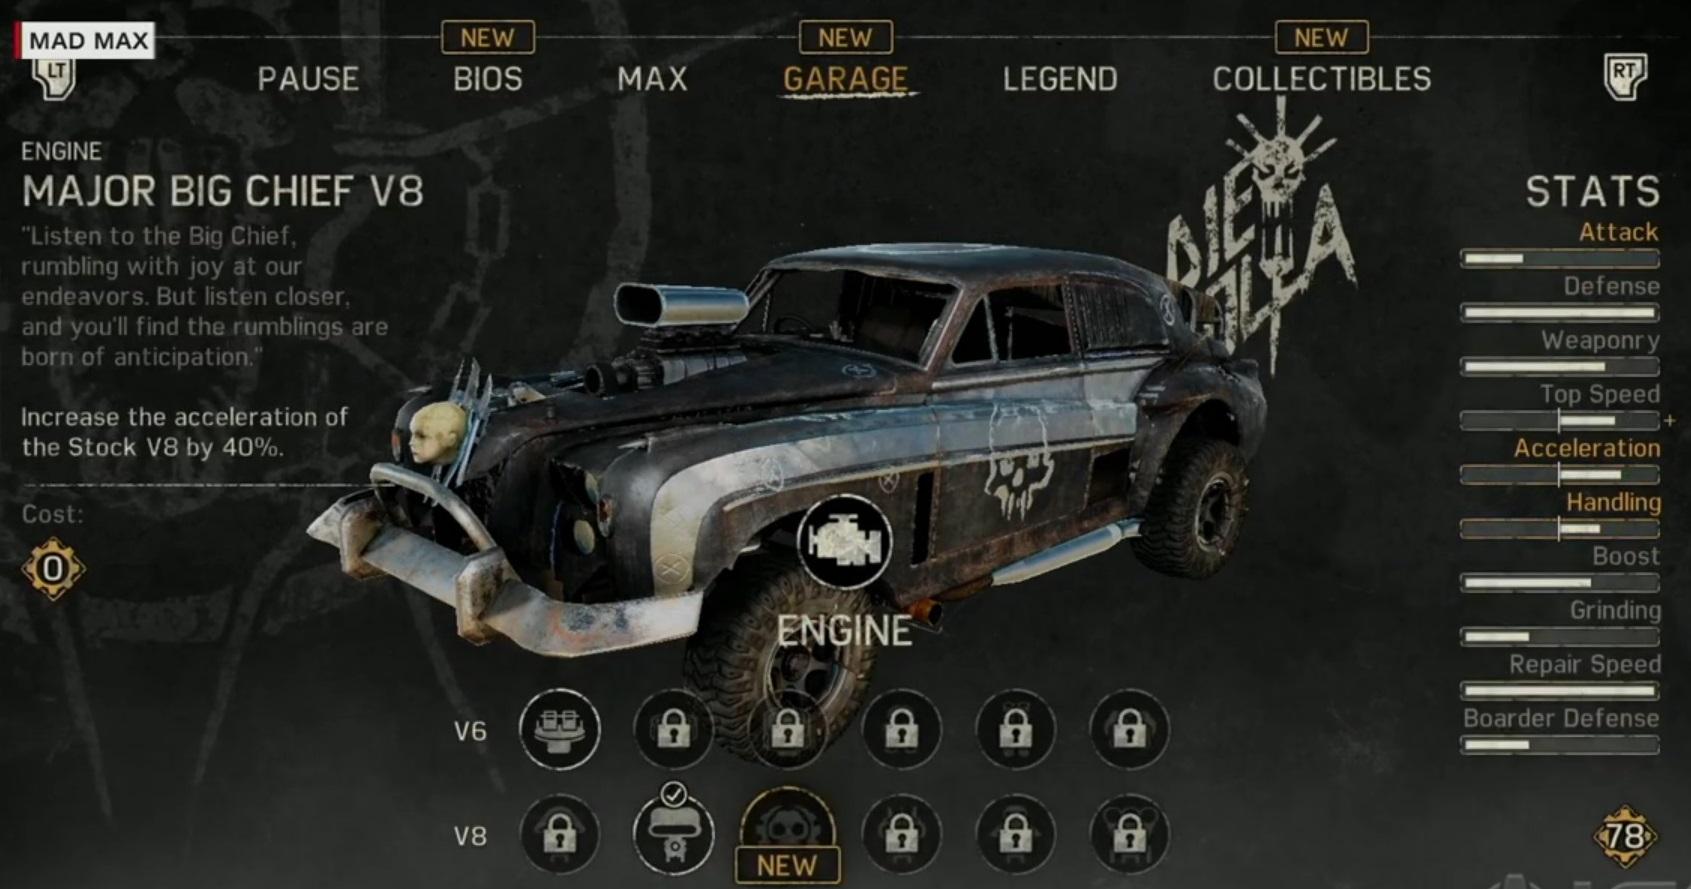 Igcd Net Rolls Royce Silver Cloud Iii In Mad Max